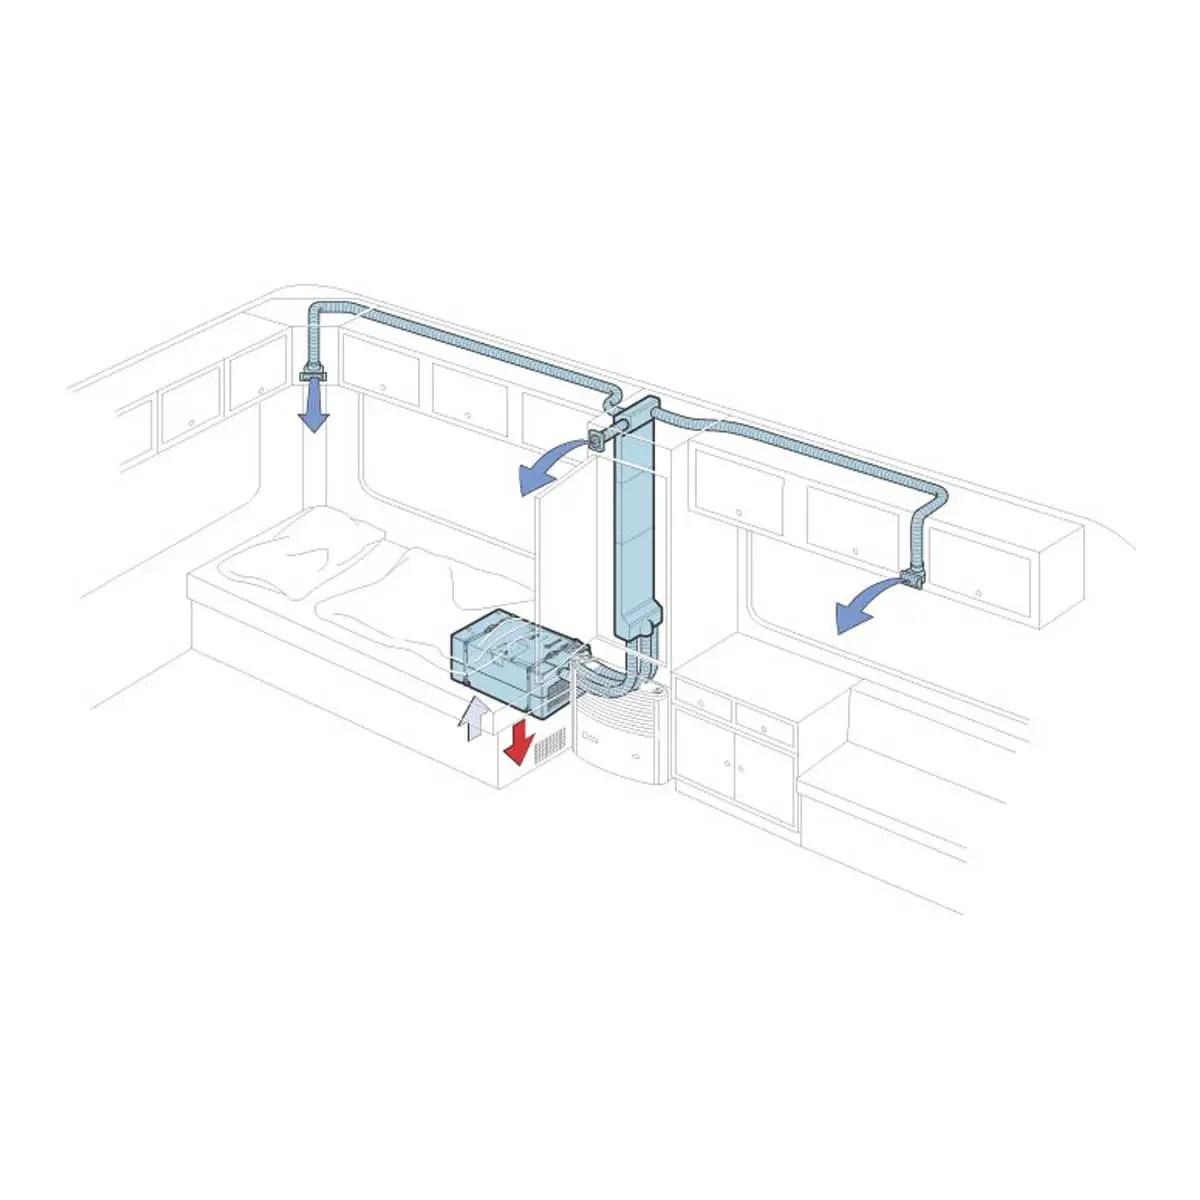 Truma Saphir Compact Storage Compartment Air Conditioning